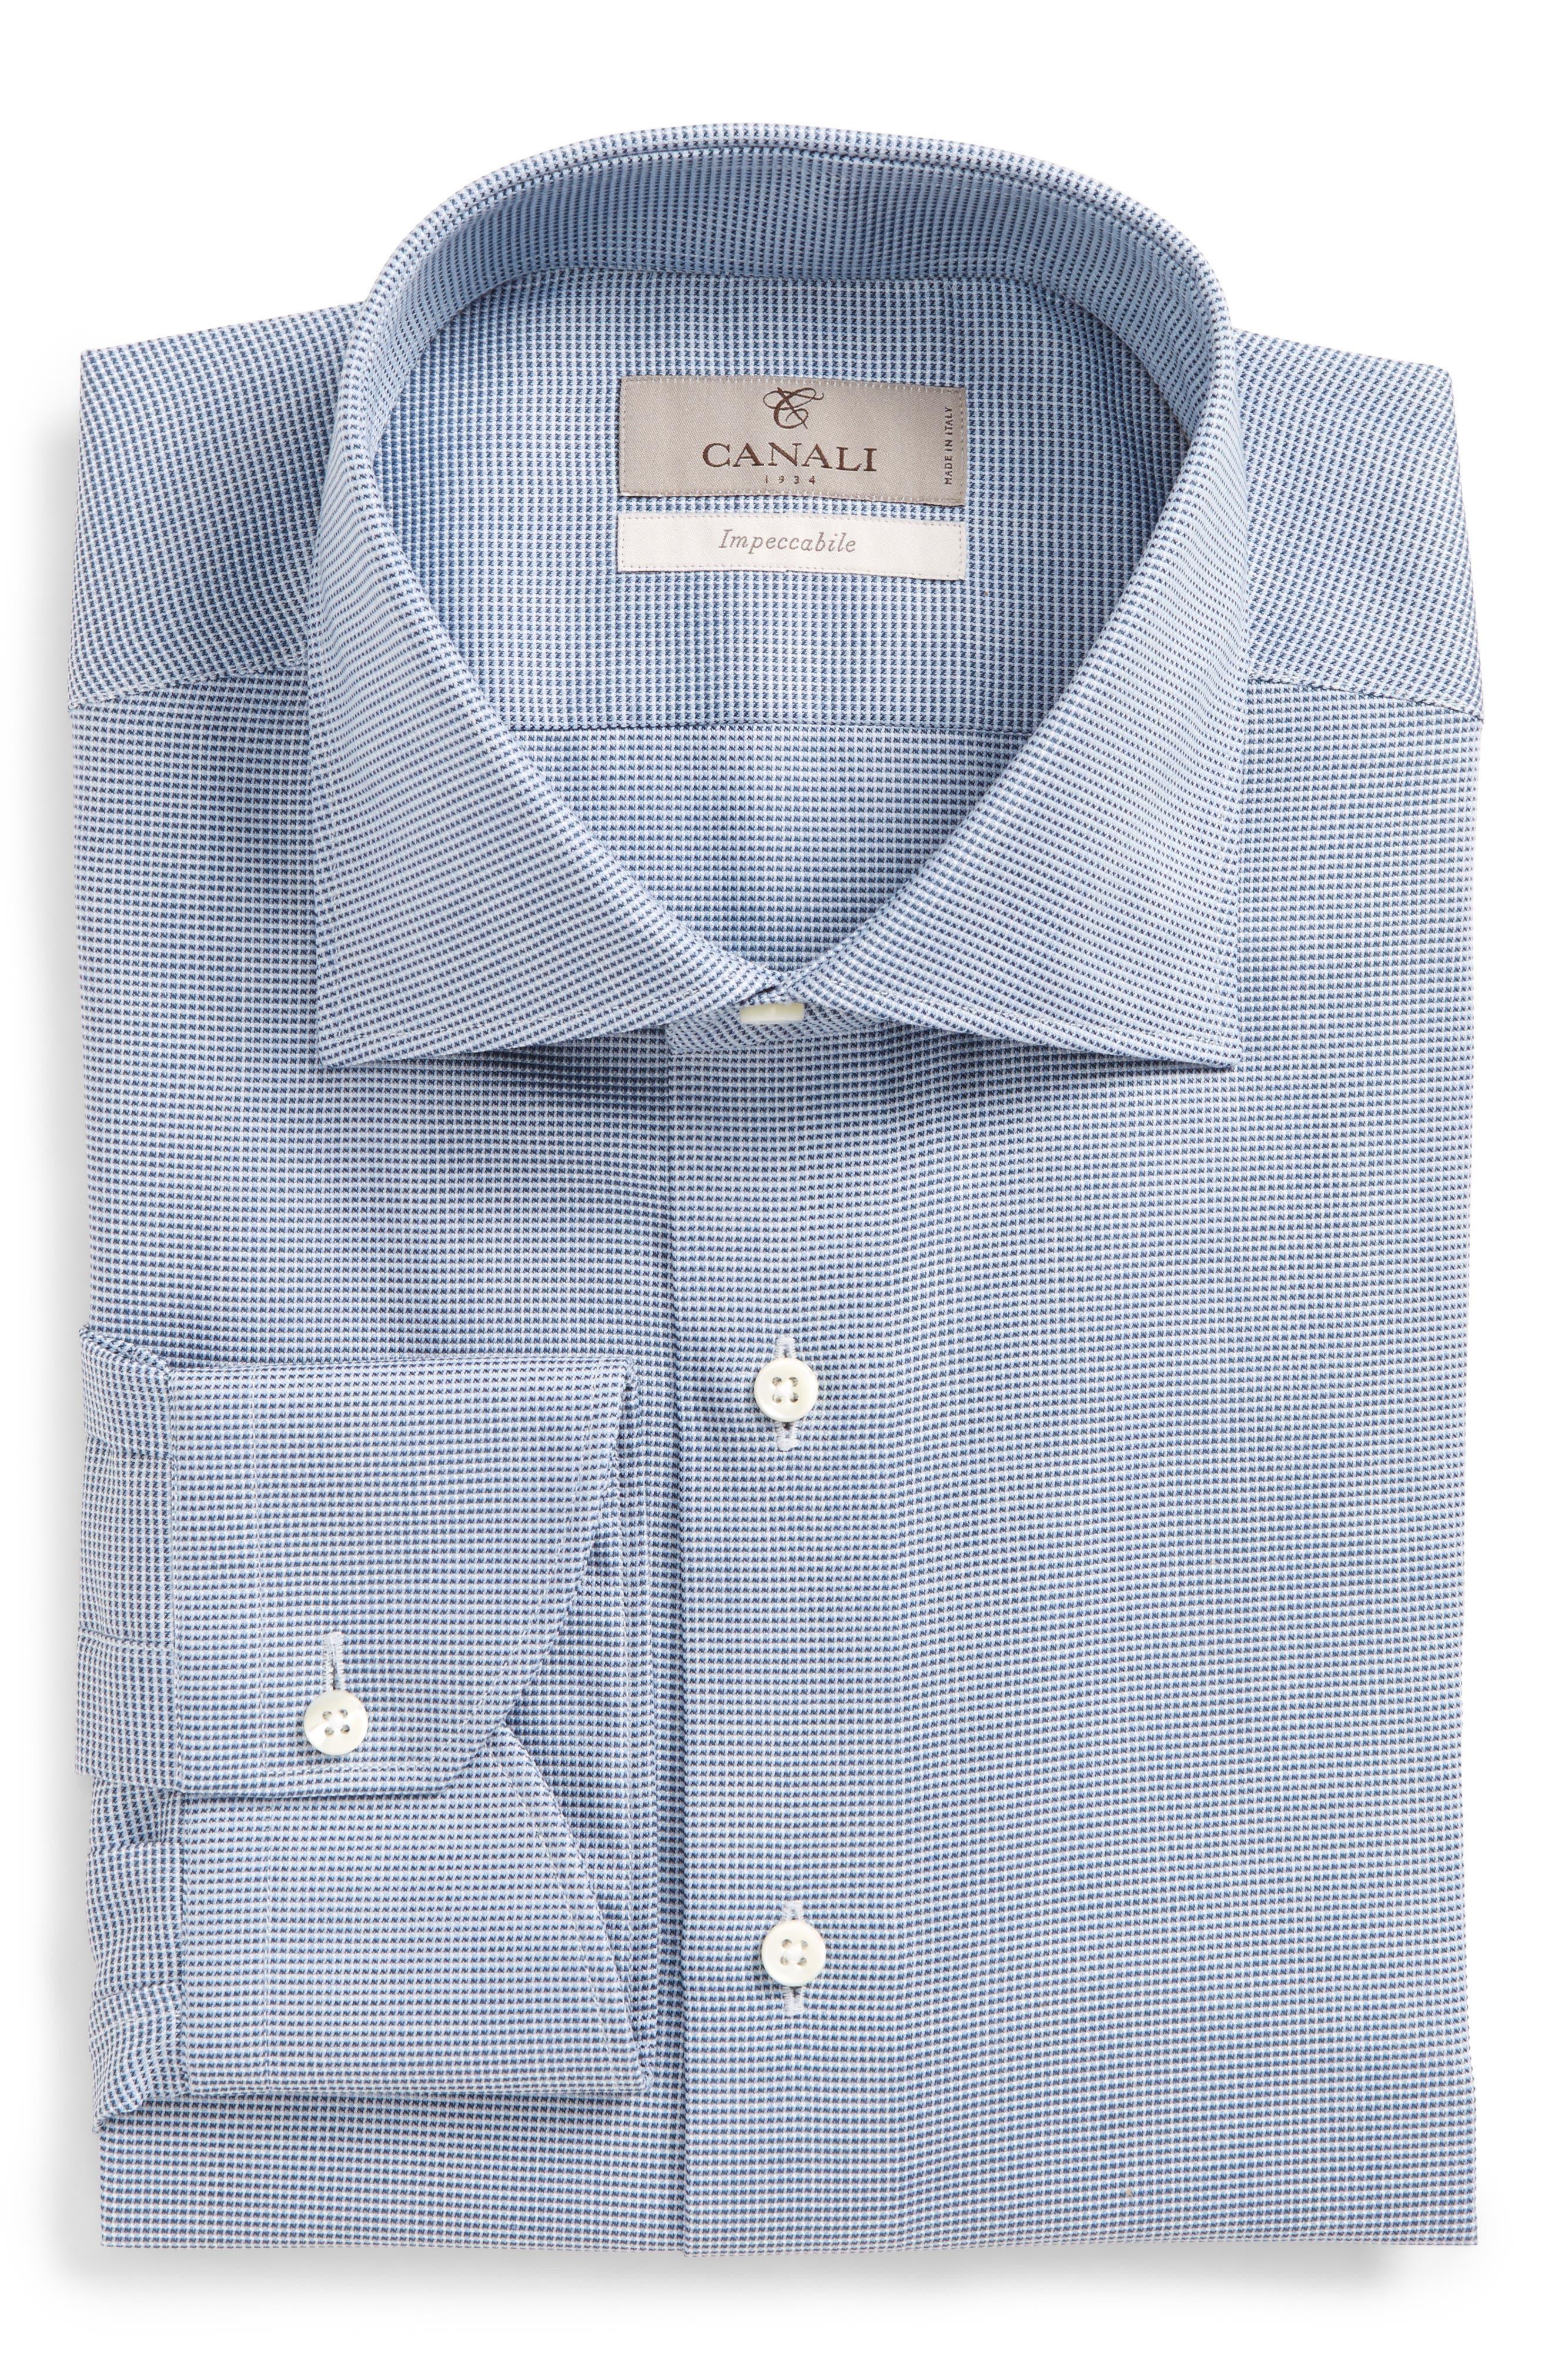 Regular Fit Solid Dress Shirt,                         Main,                         color, 400